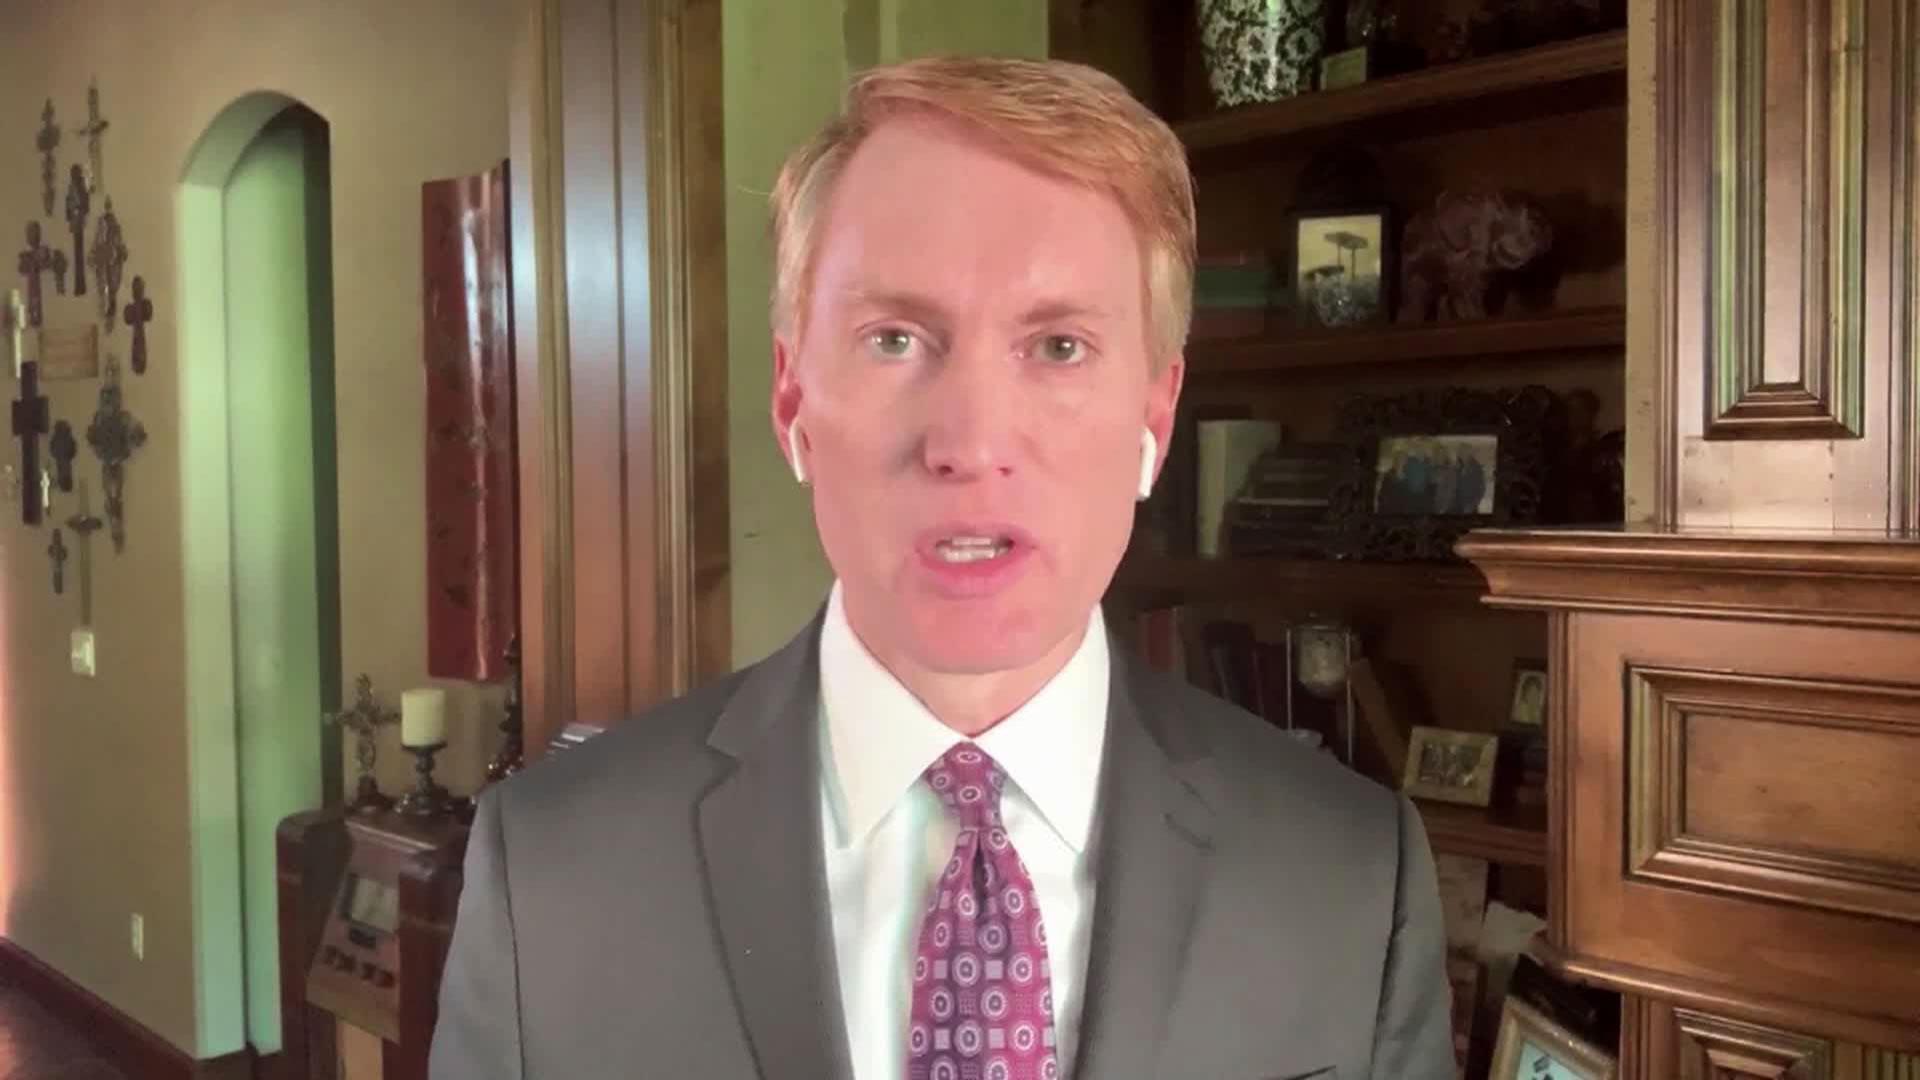 Oklahoma Senator James Lankford speaks with CNN's Jake Tapper on Sunday, June 14.